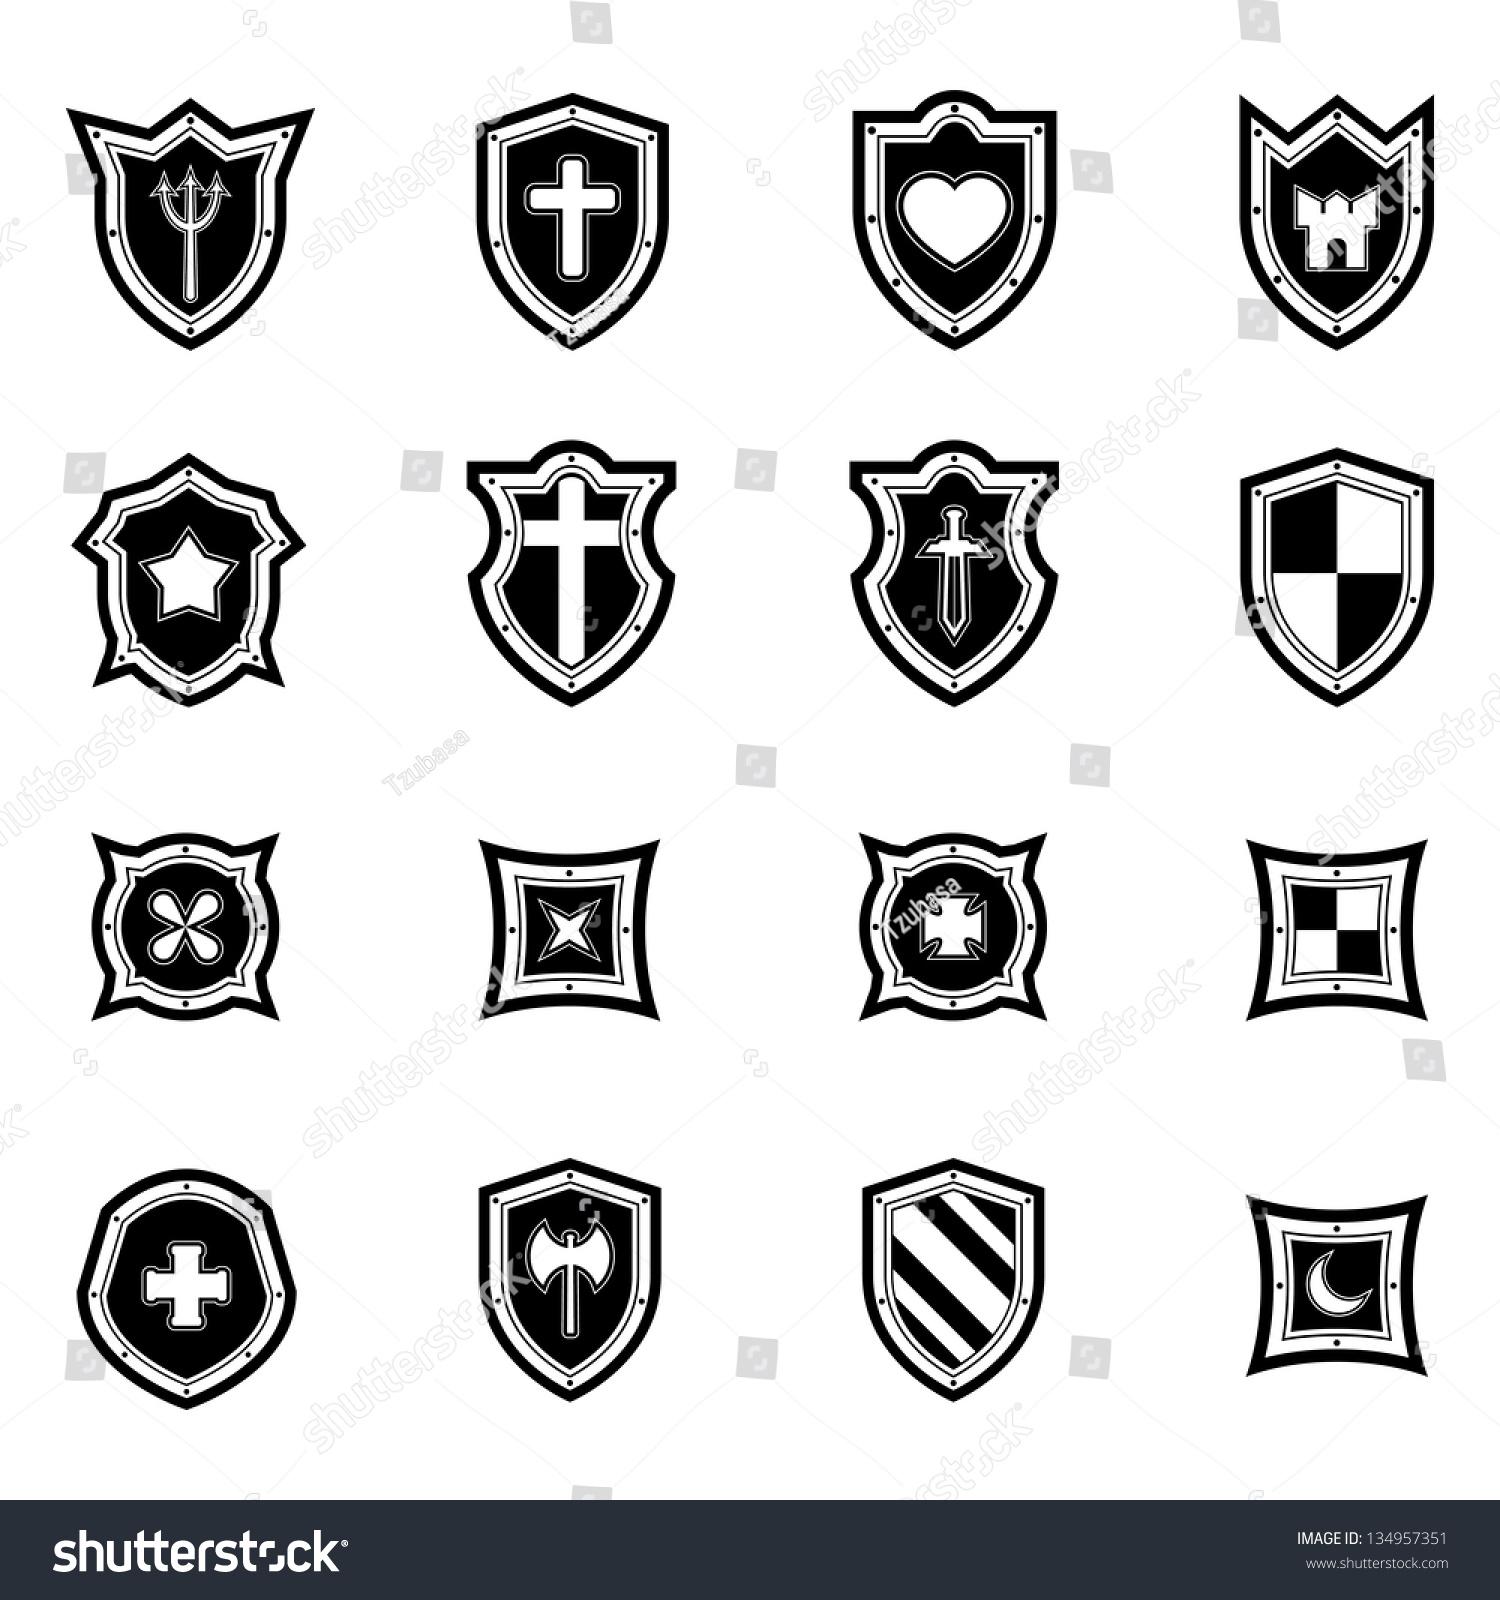 Shield Icon Set Black And White Stock Vector Illustration 134957351 ...